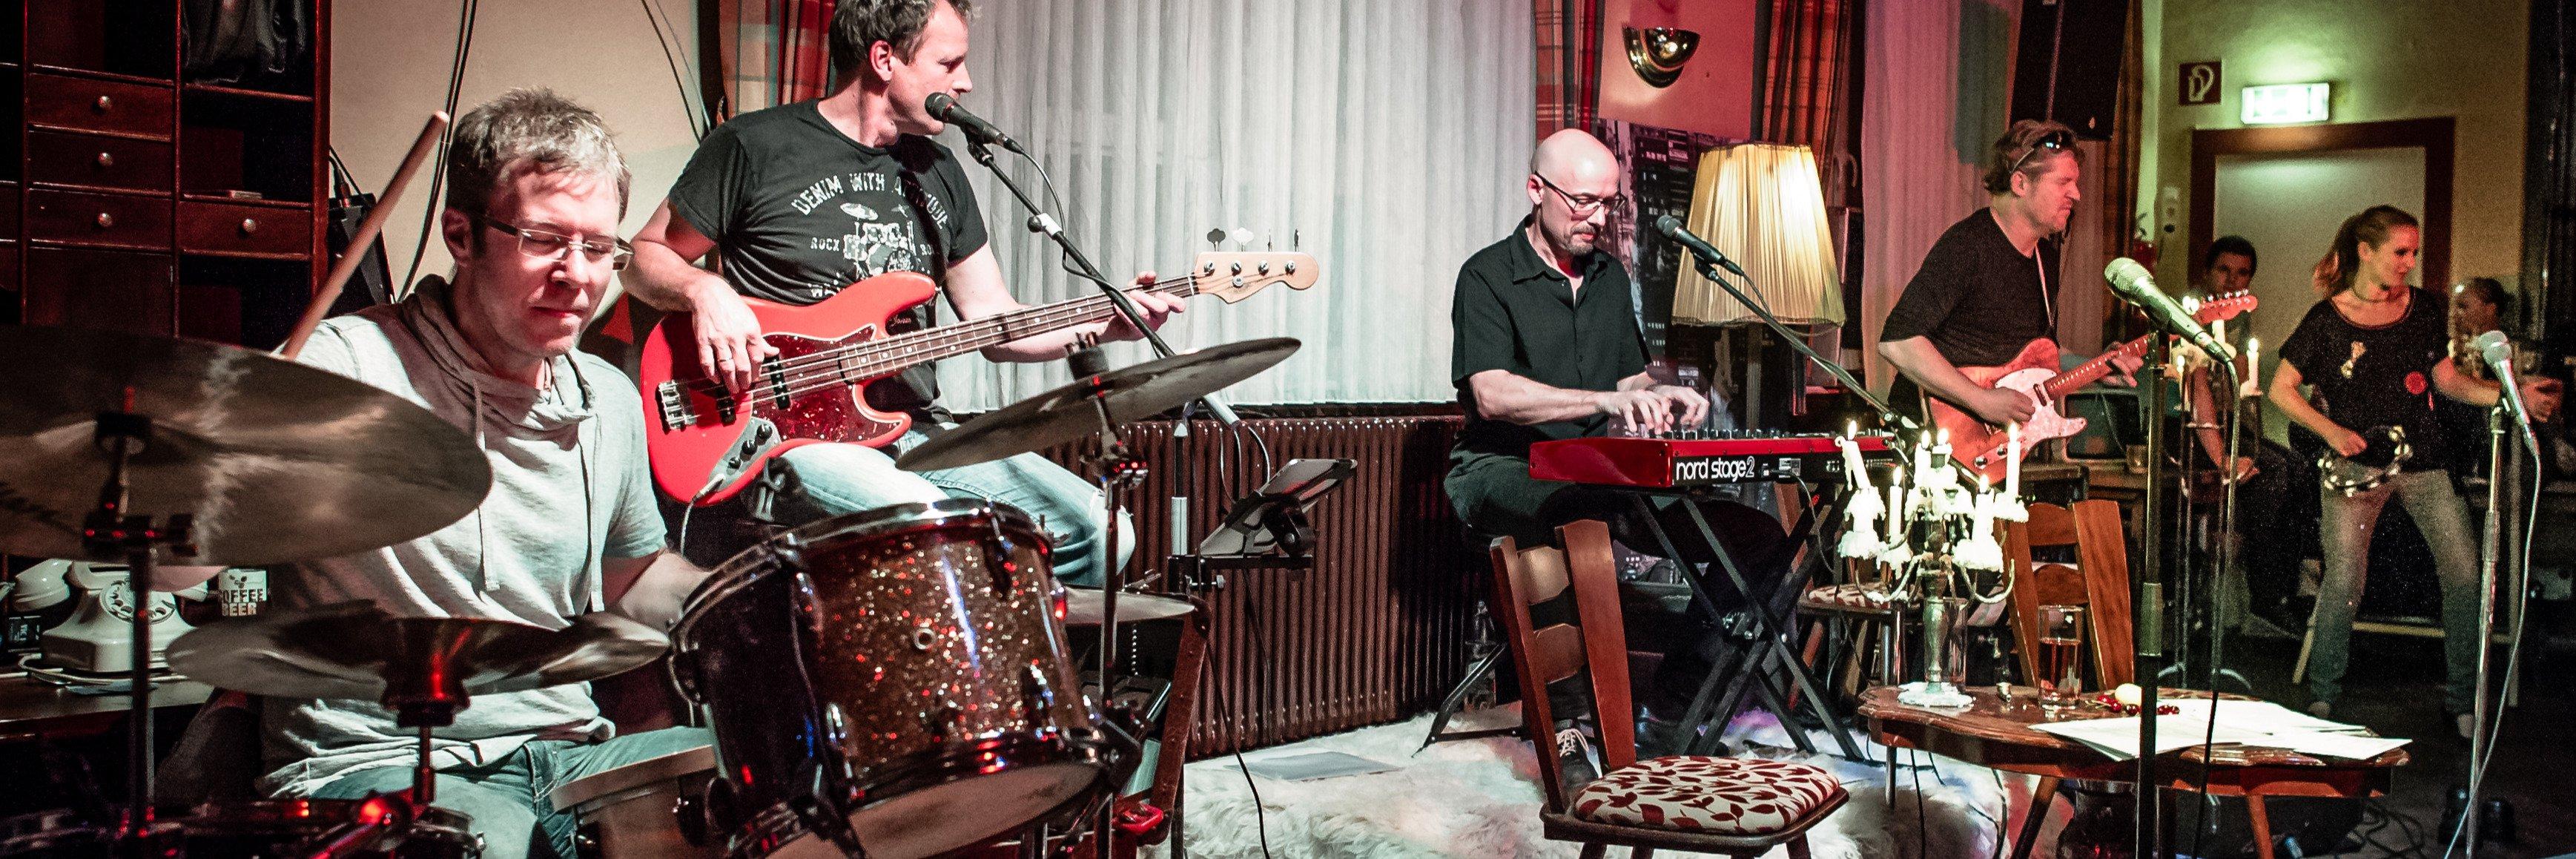 Groove incorporation / Beim Schupi